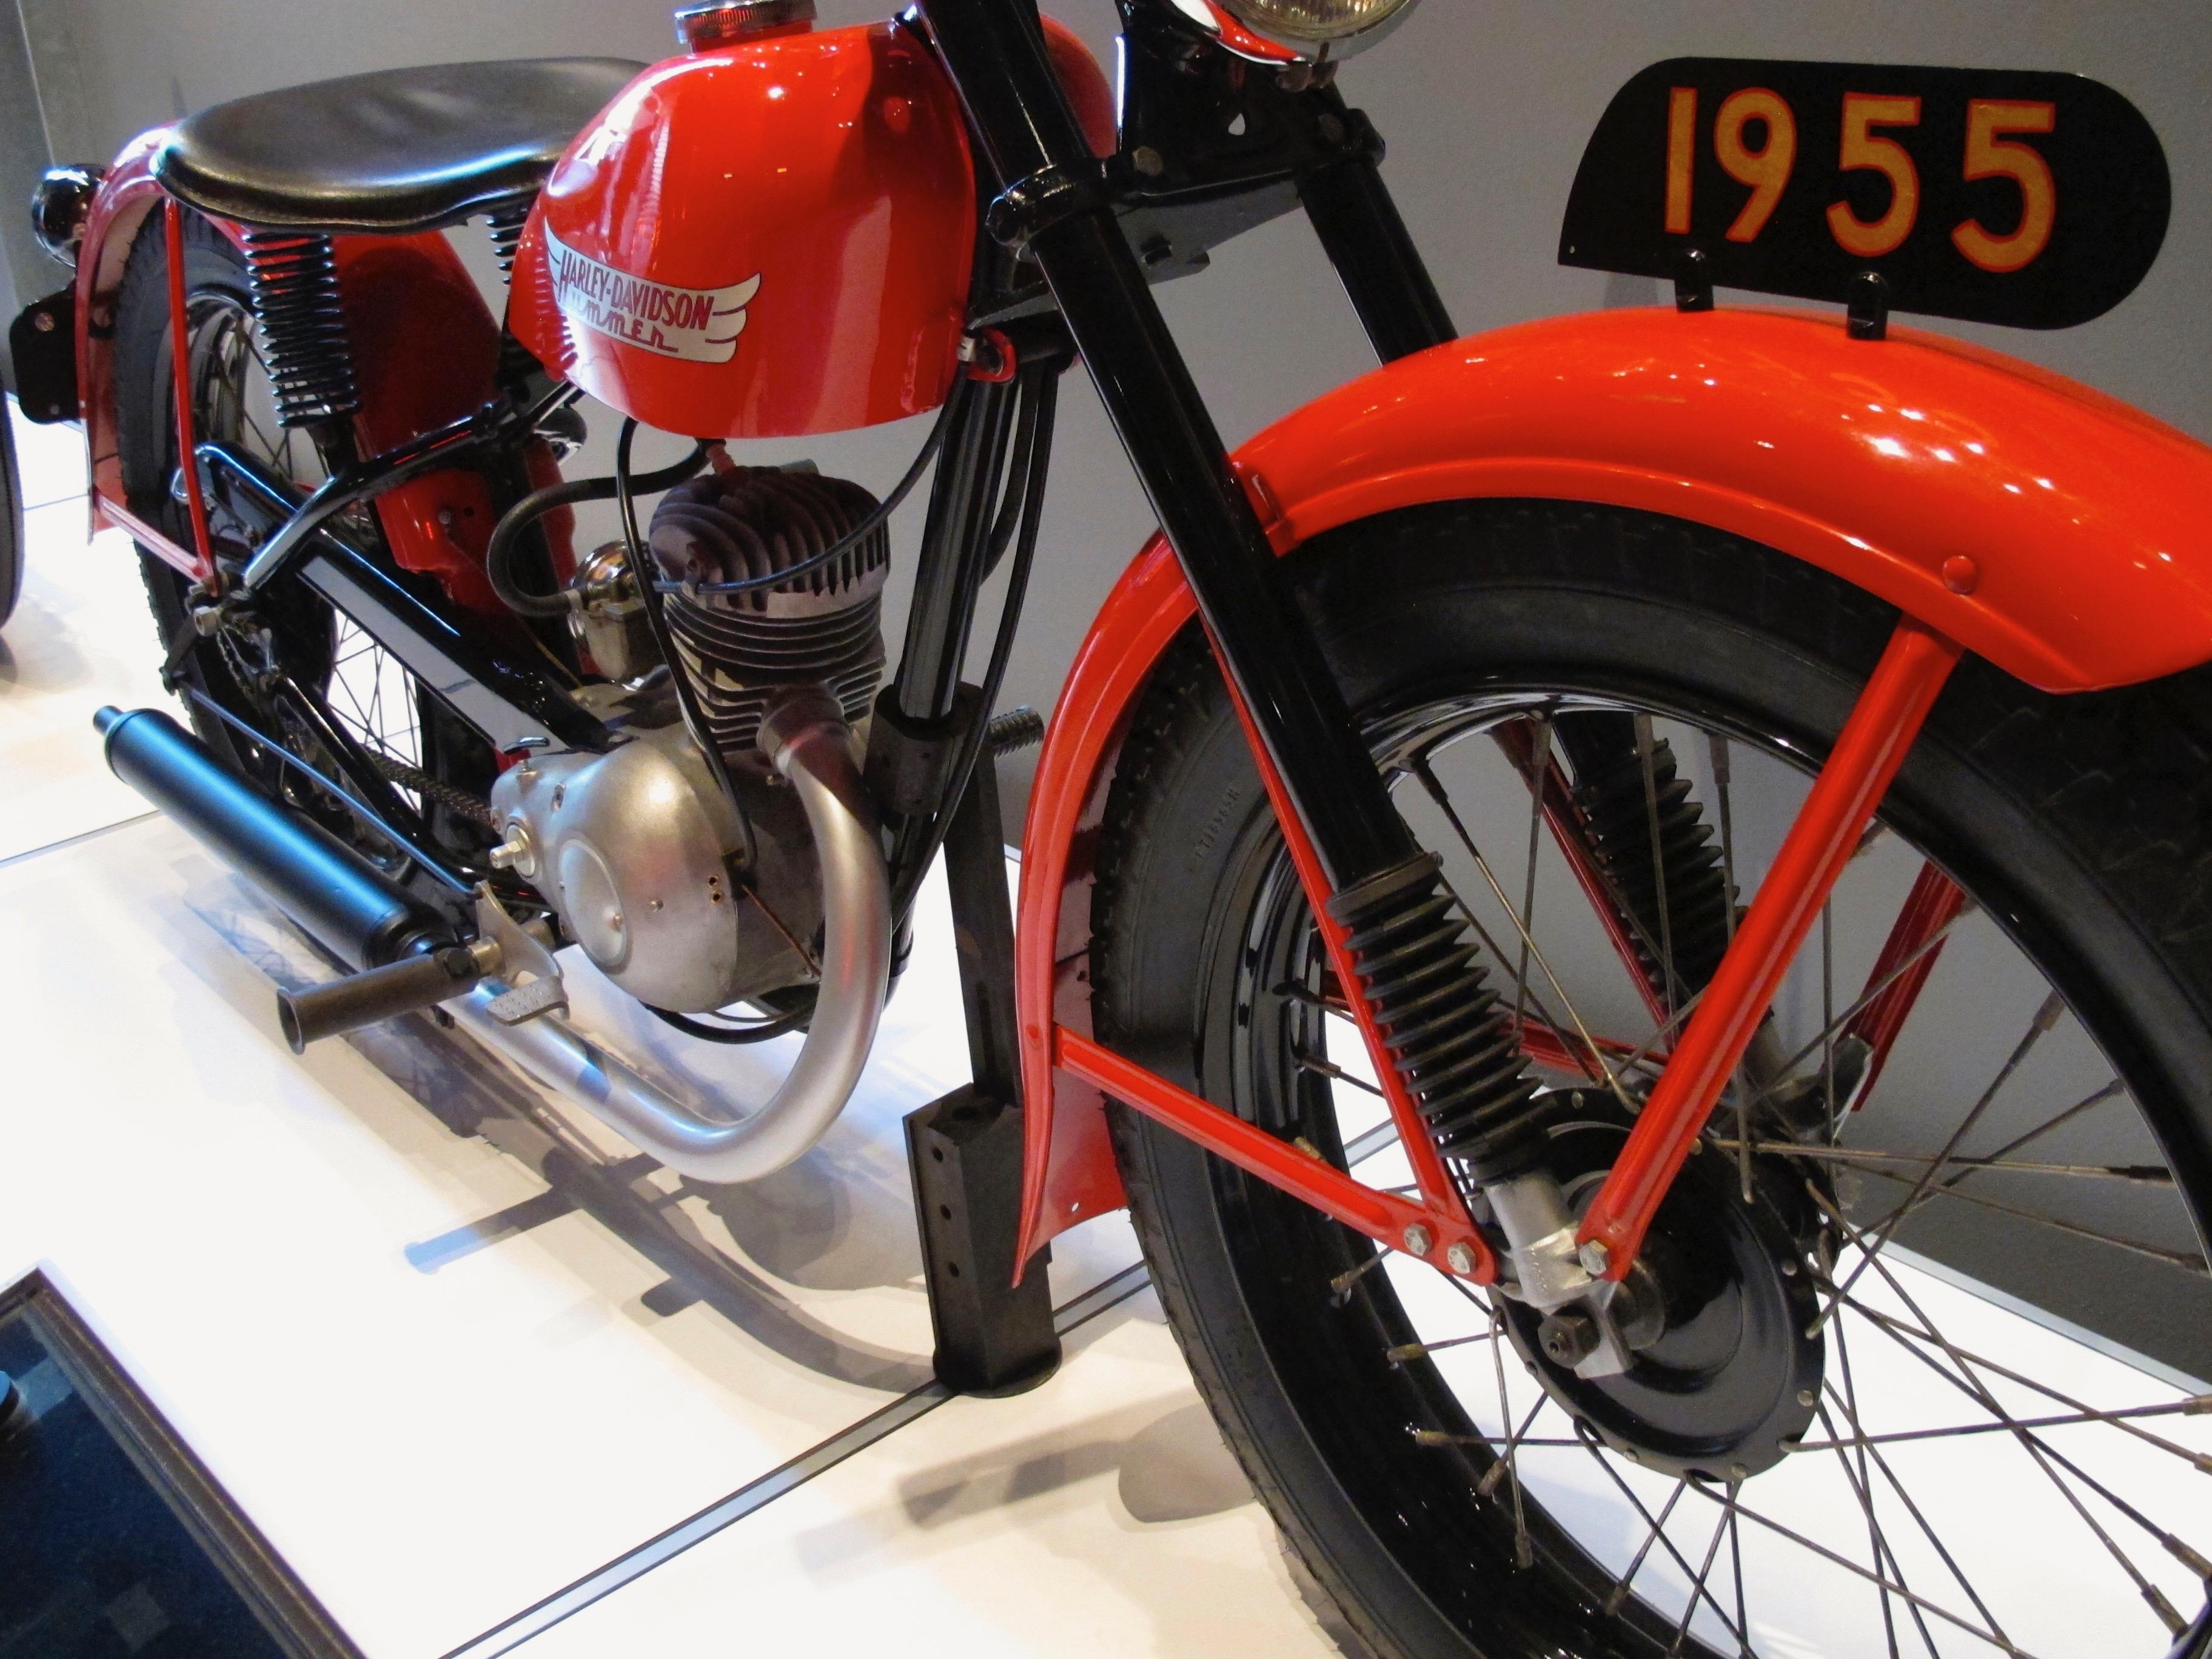 Harley-Davidson Two-Stroke Engine History